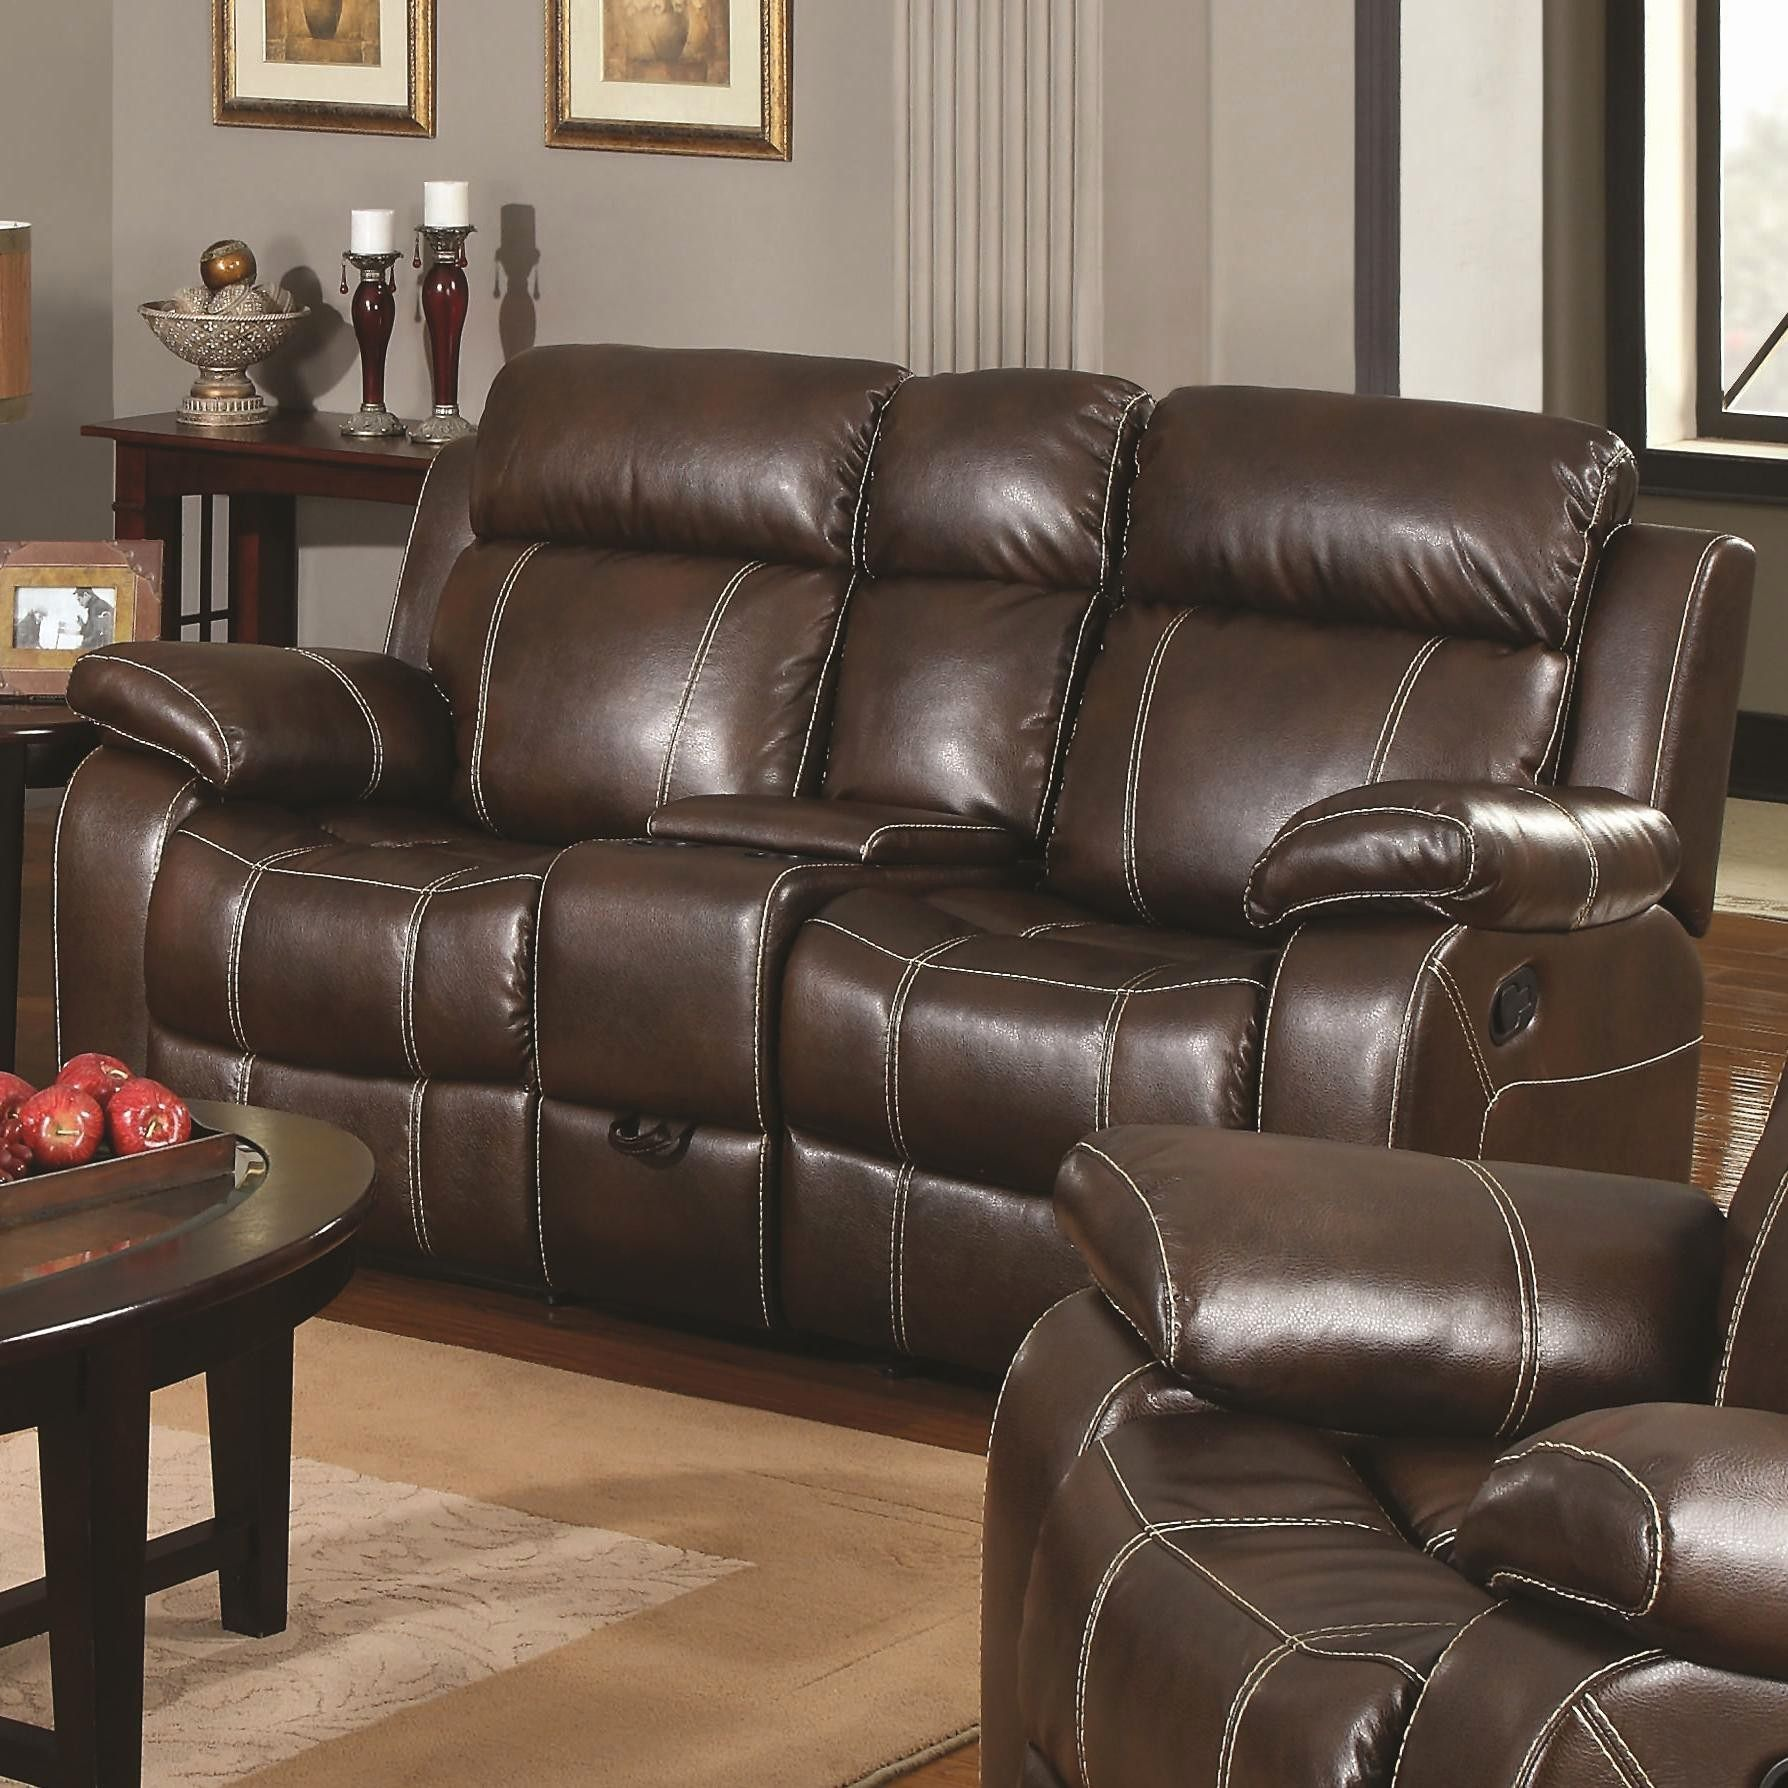 Unique Reclining Microfiber Sofa And Loveseat Set Living Room Leather Rocker Recliner Microfibe Couch And Loveseat Leather Reclining Sofa Sofa And Loveseat Set